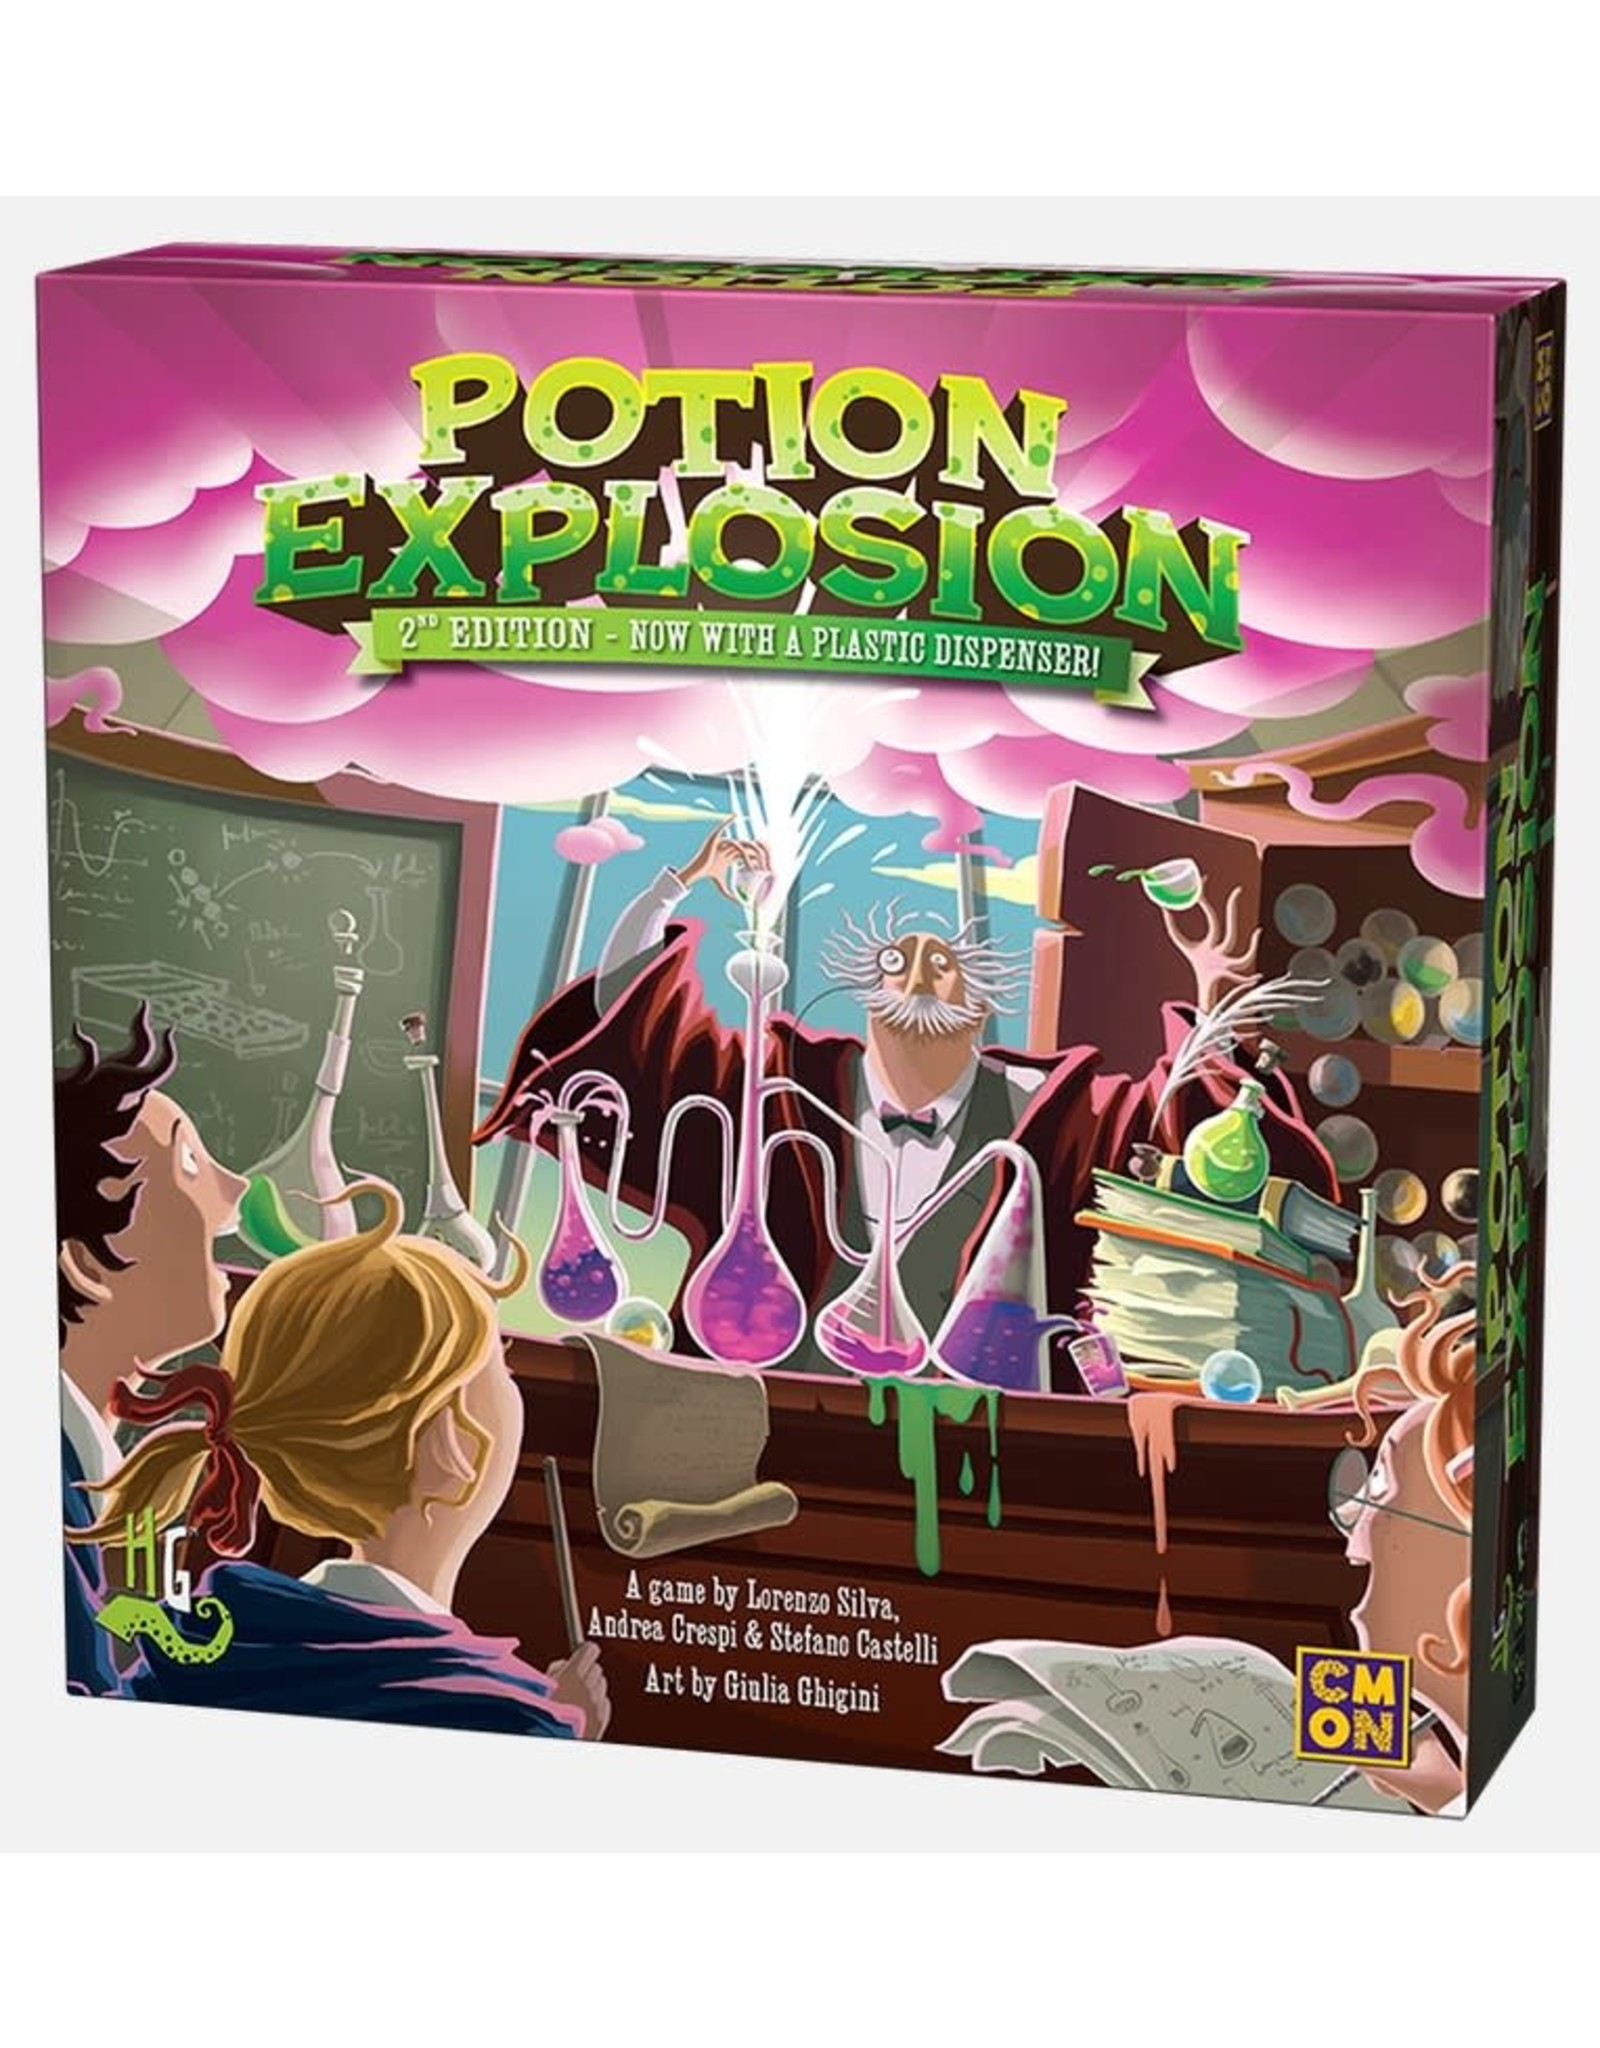 CMON Potion Explosion 2ed